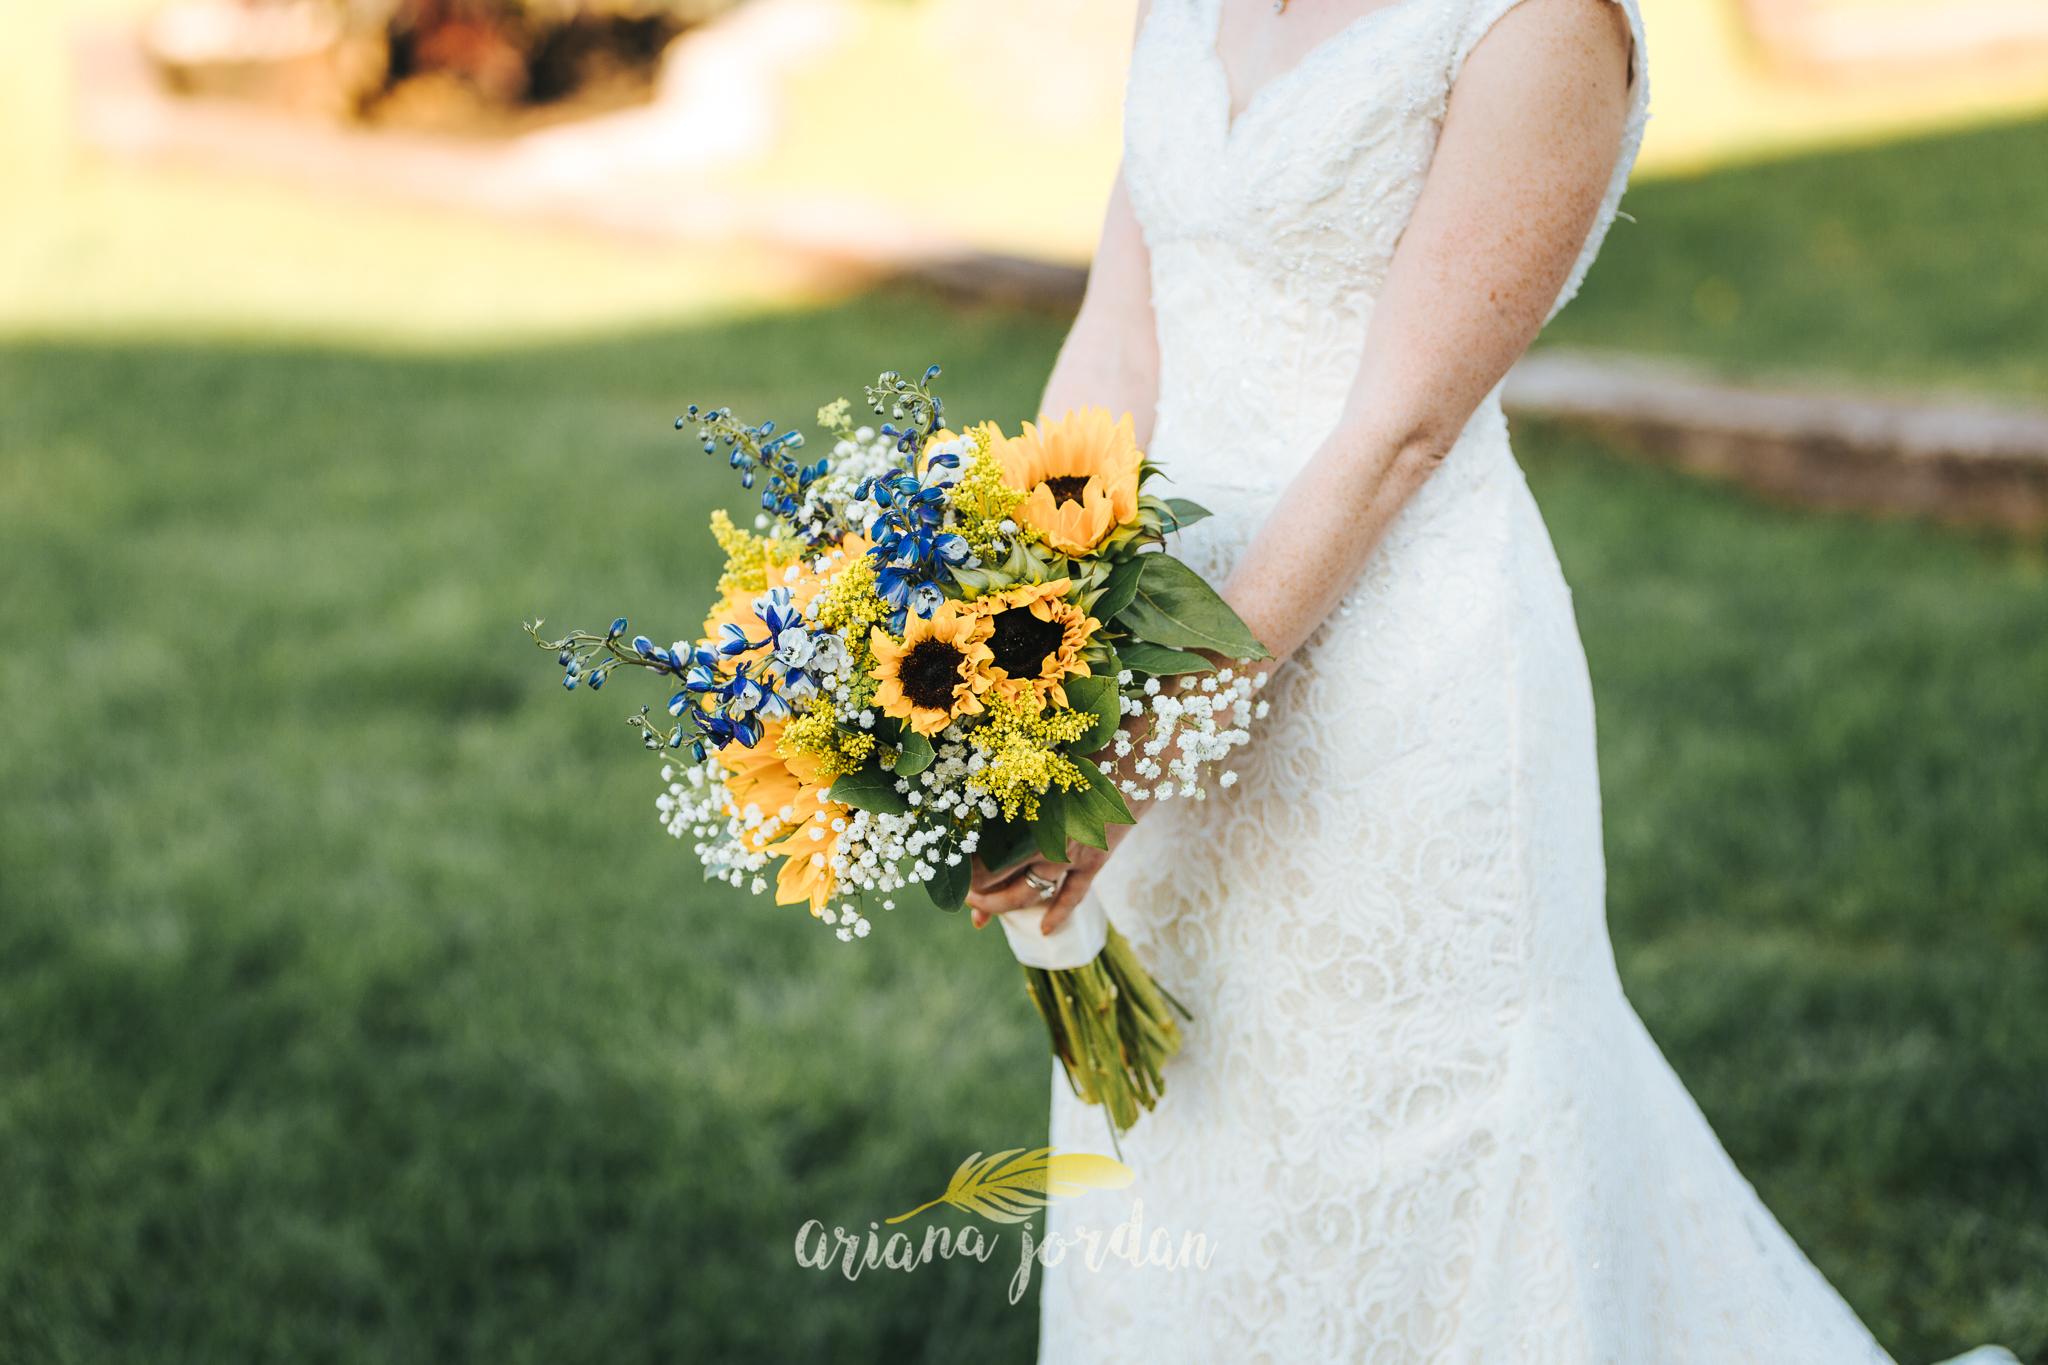 105 Ariana Jordan Photography -Moonlight Fields Lexington Ky Wedding Photographer 4860.jpg